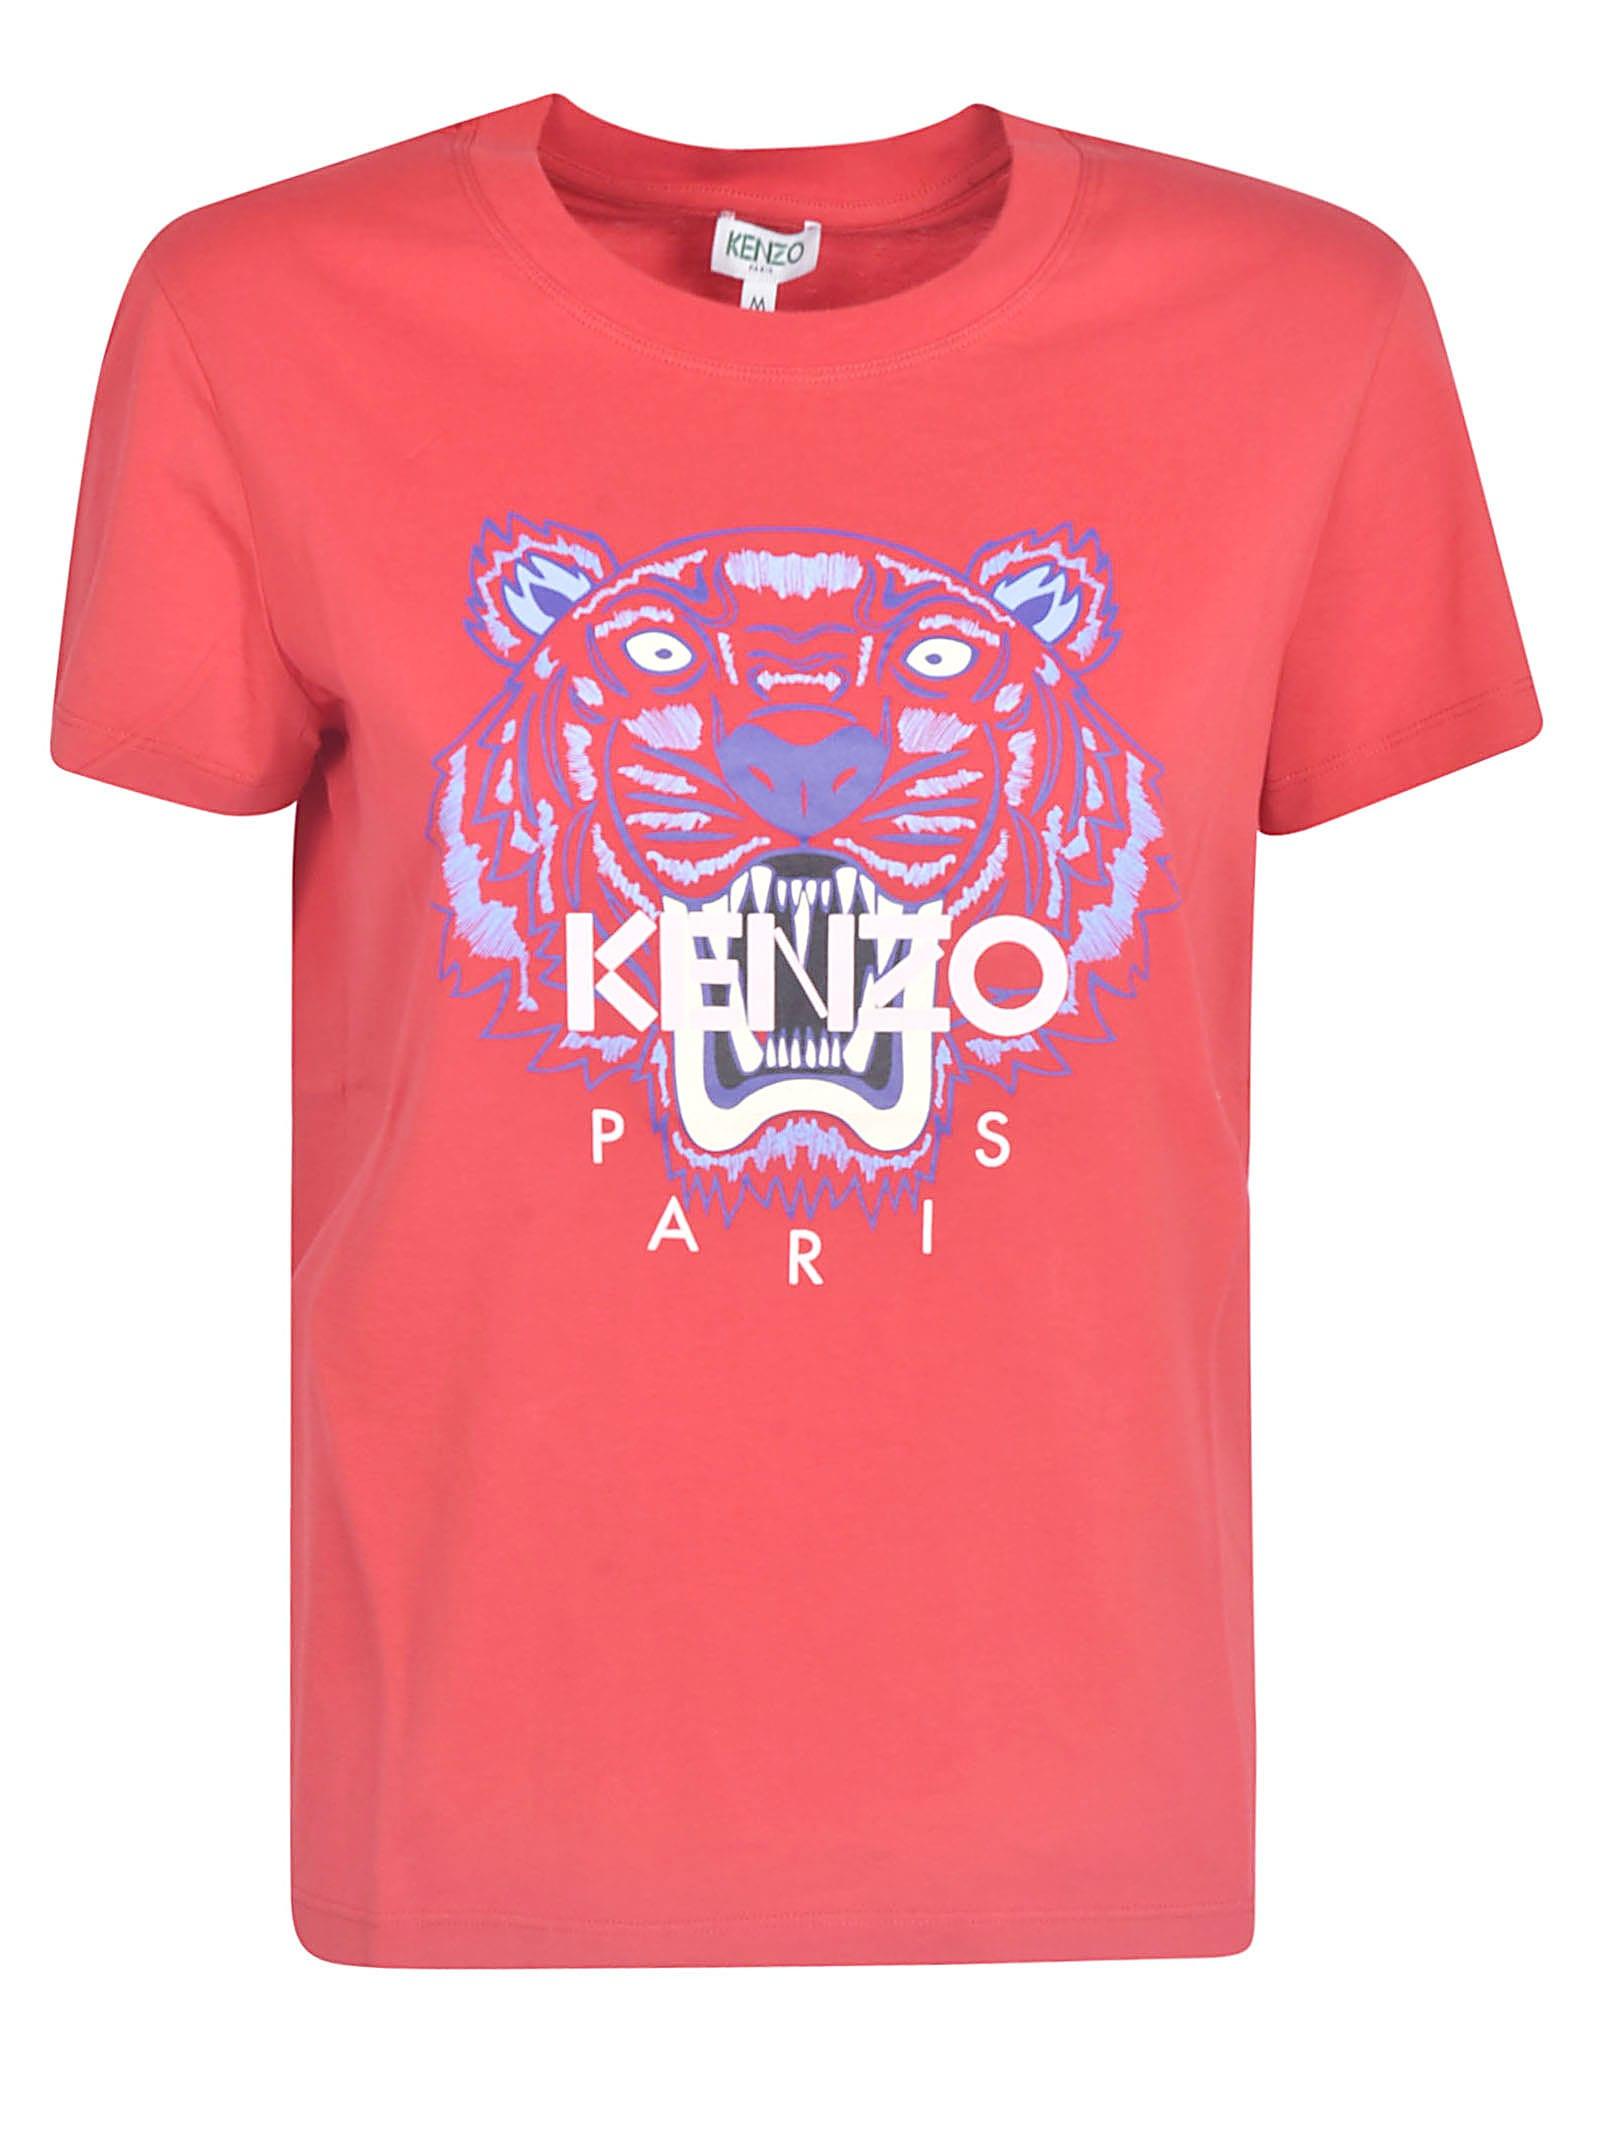 Kenzo Cottons CLASSIC TIGER T-SHIRT